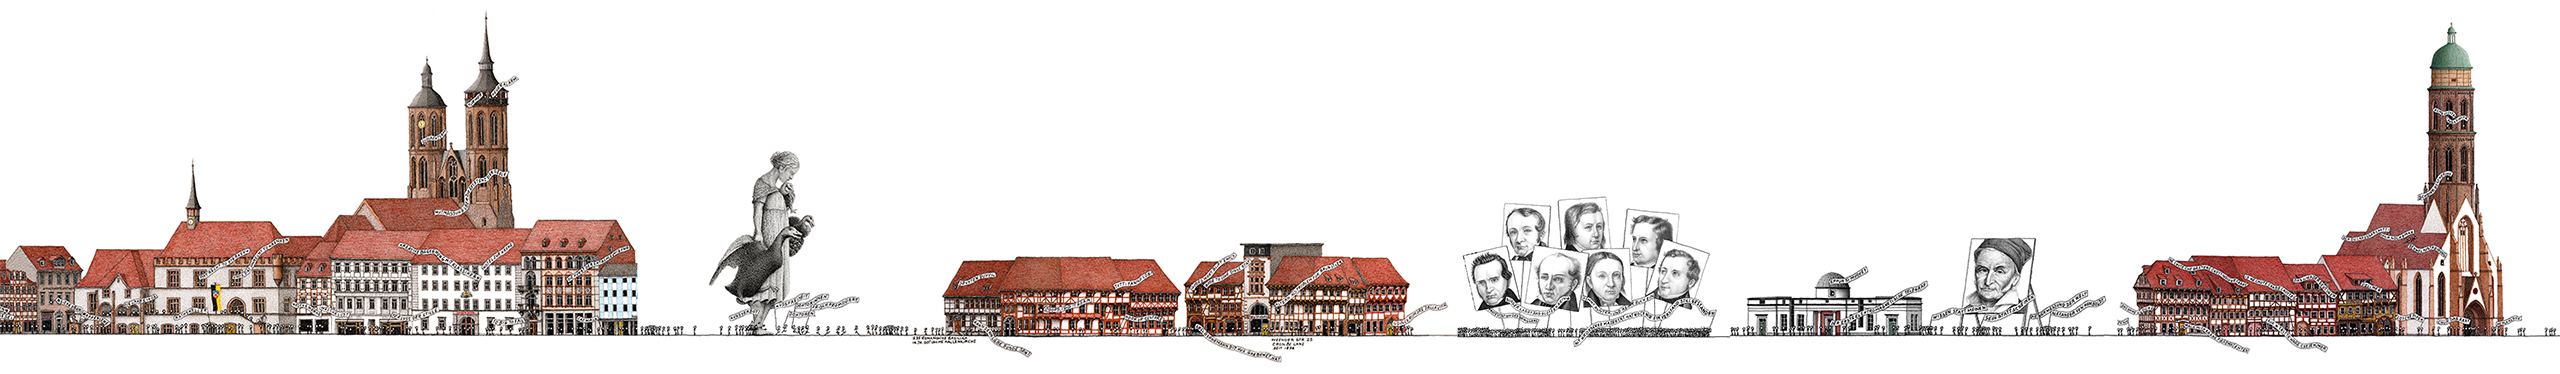 Stadtansicht Göttingen